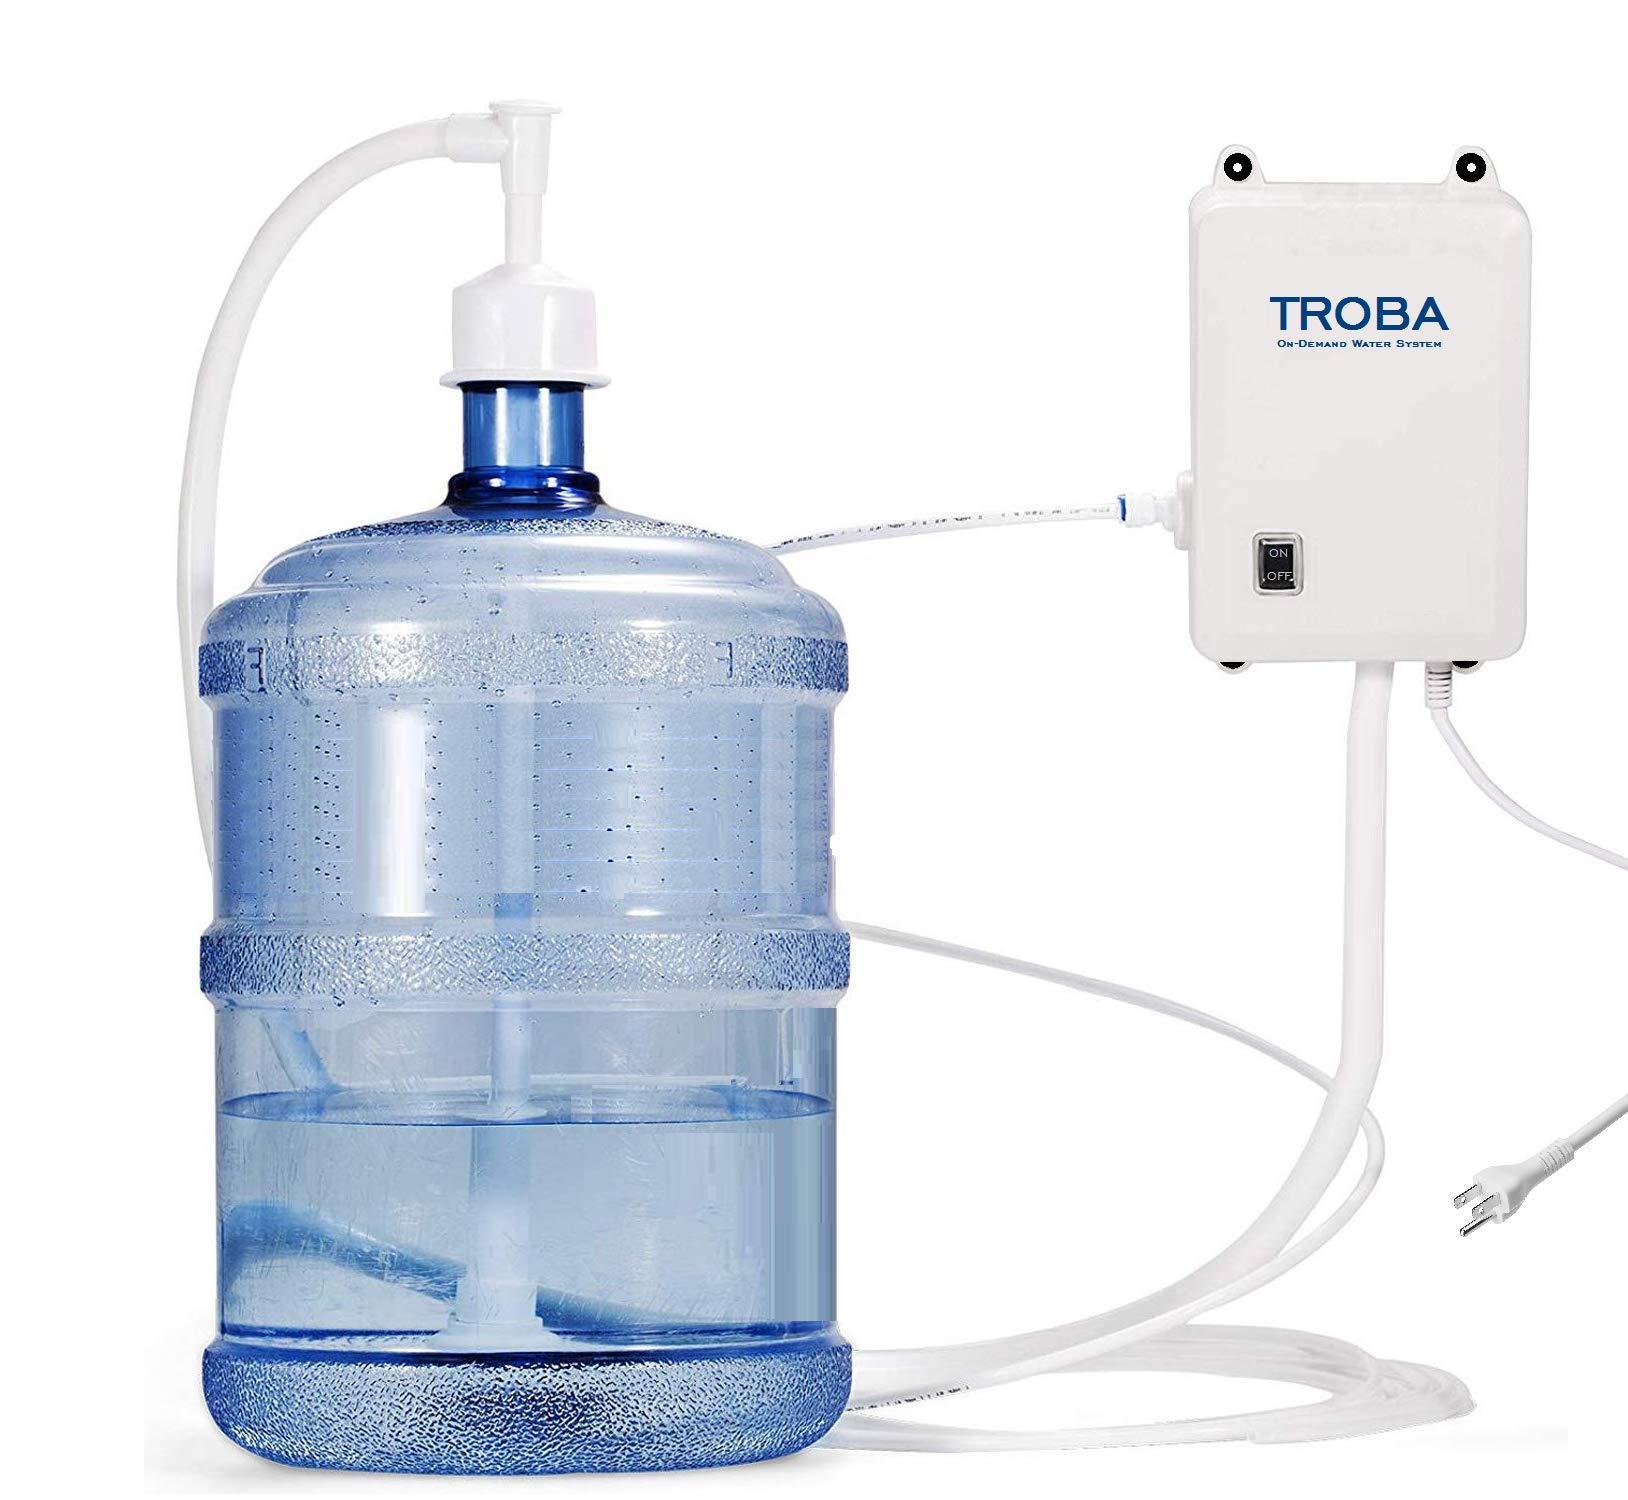 NEW 120v AC Bottled Water Dispensing Pump System by Bottled Water Dispensing System